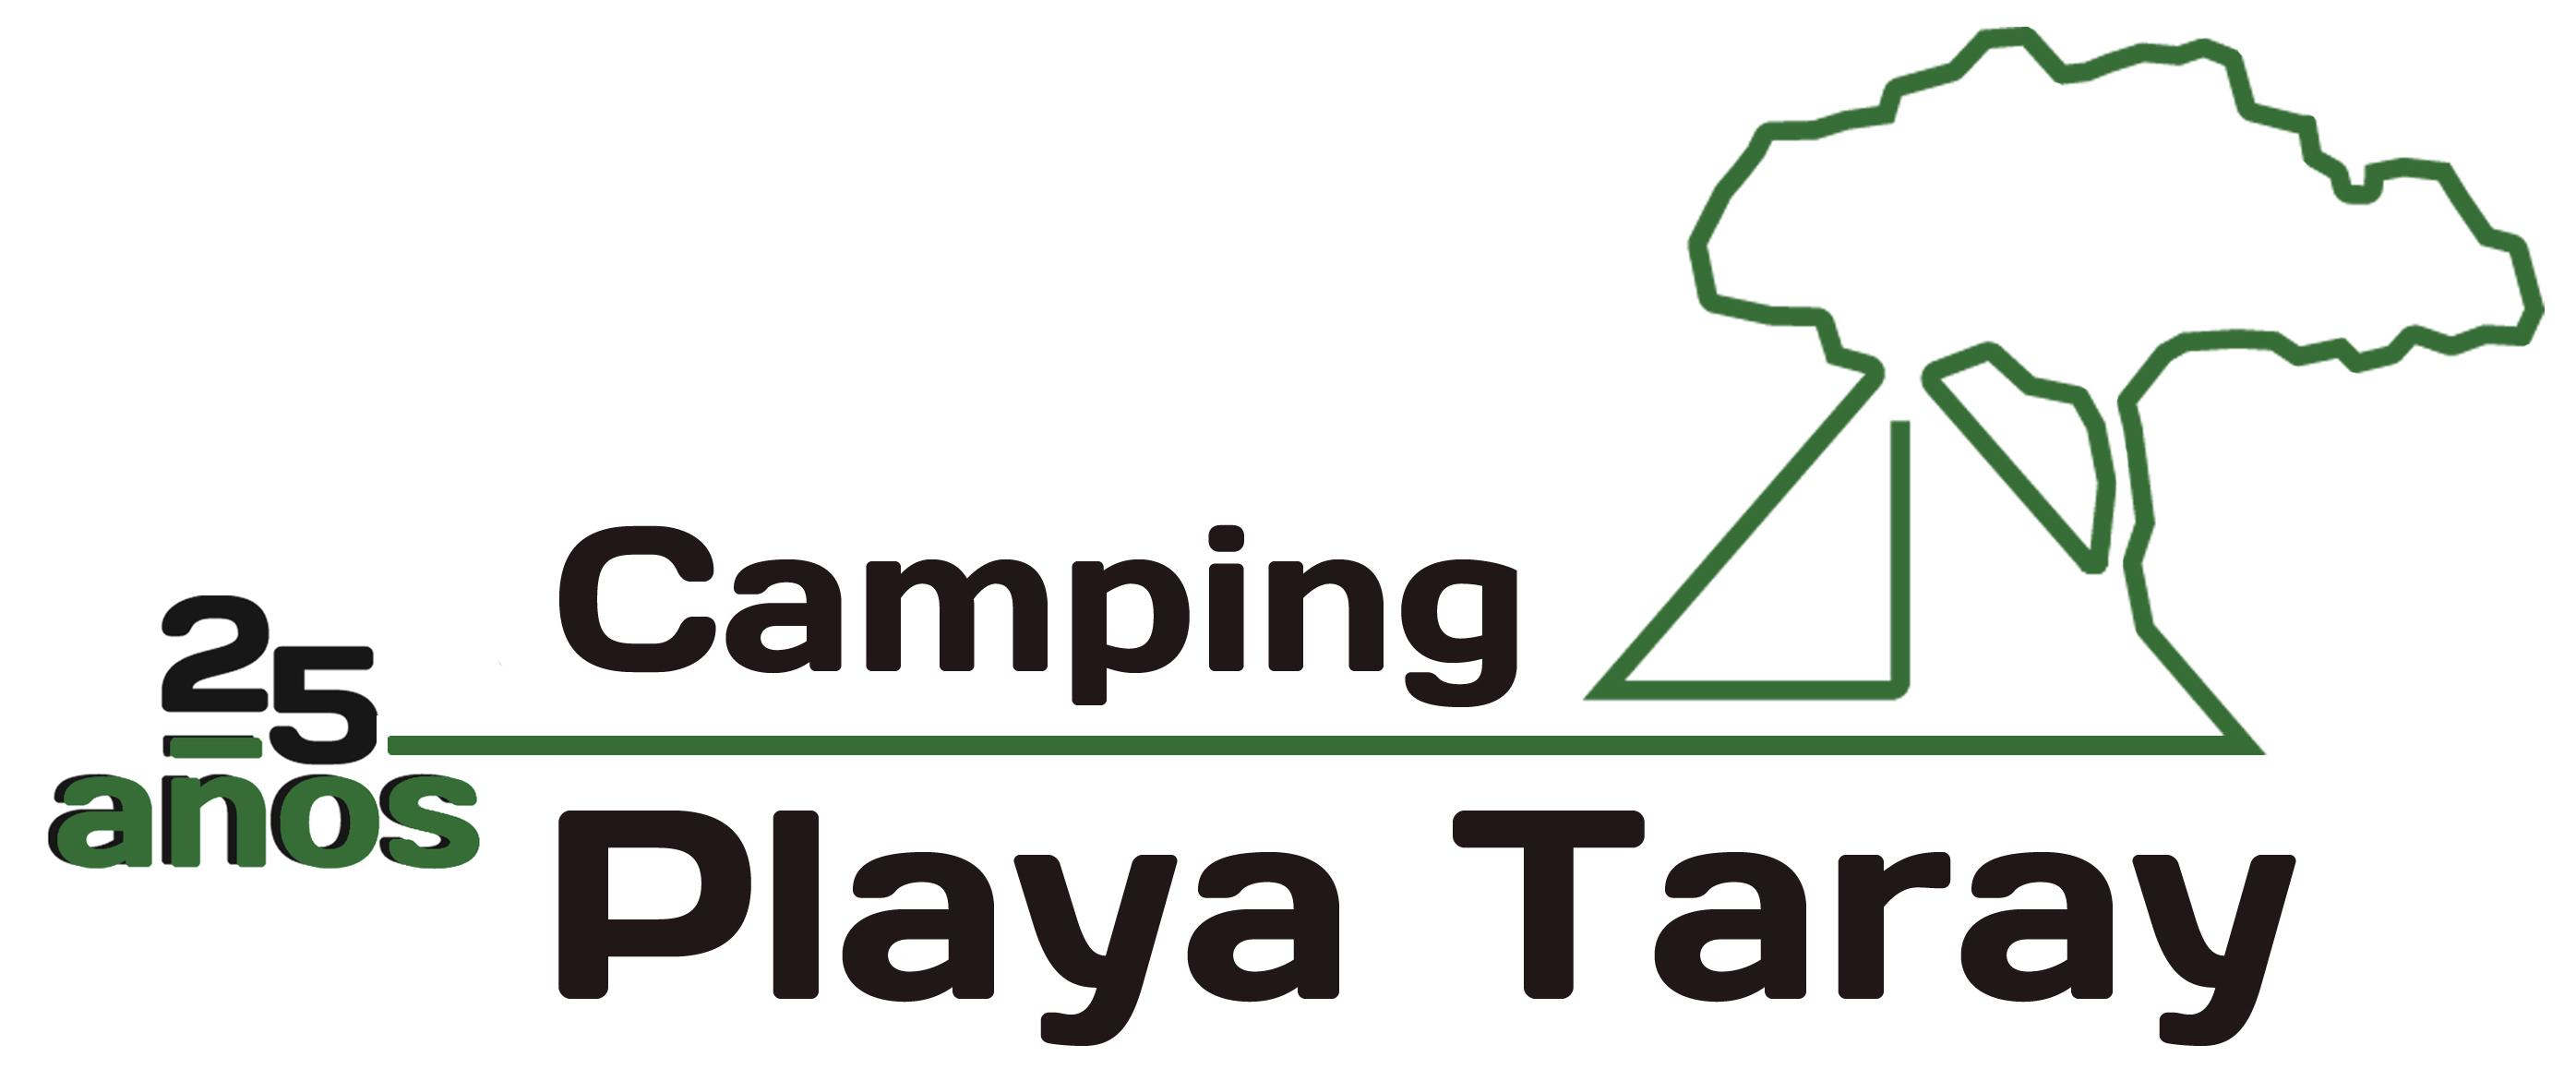 Imagen de Camping Taray,                                         propietario de Camping Playa Taray